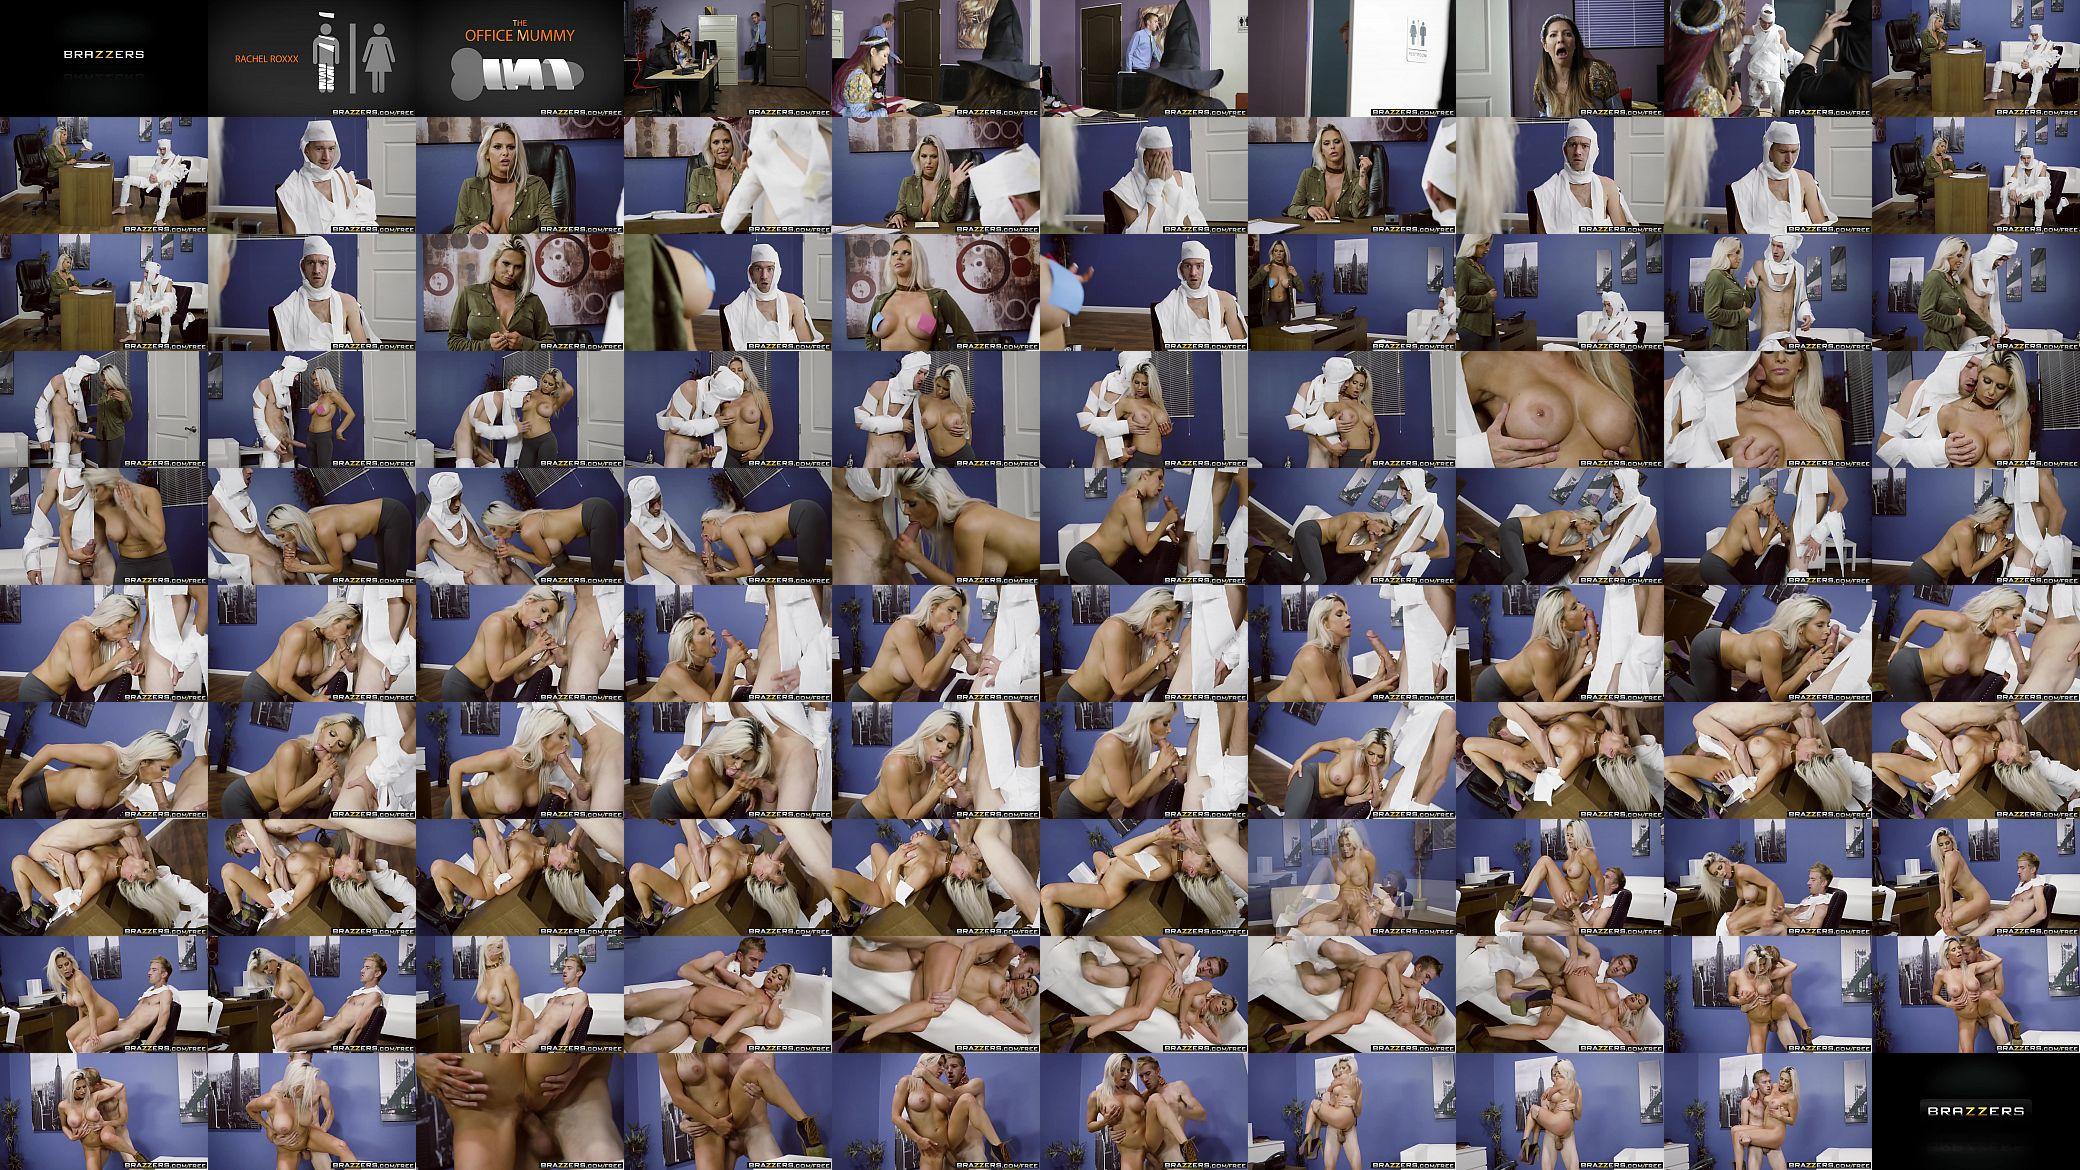 rachel roxxx office mummy